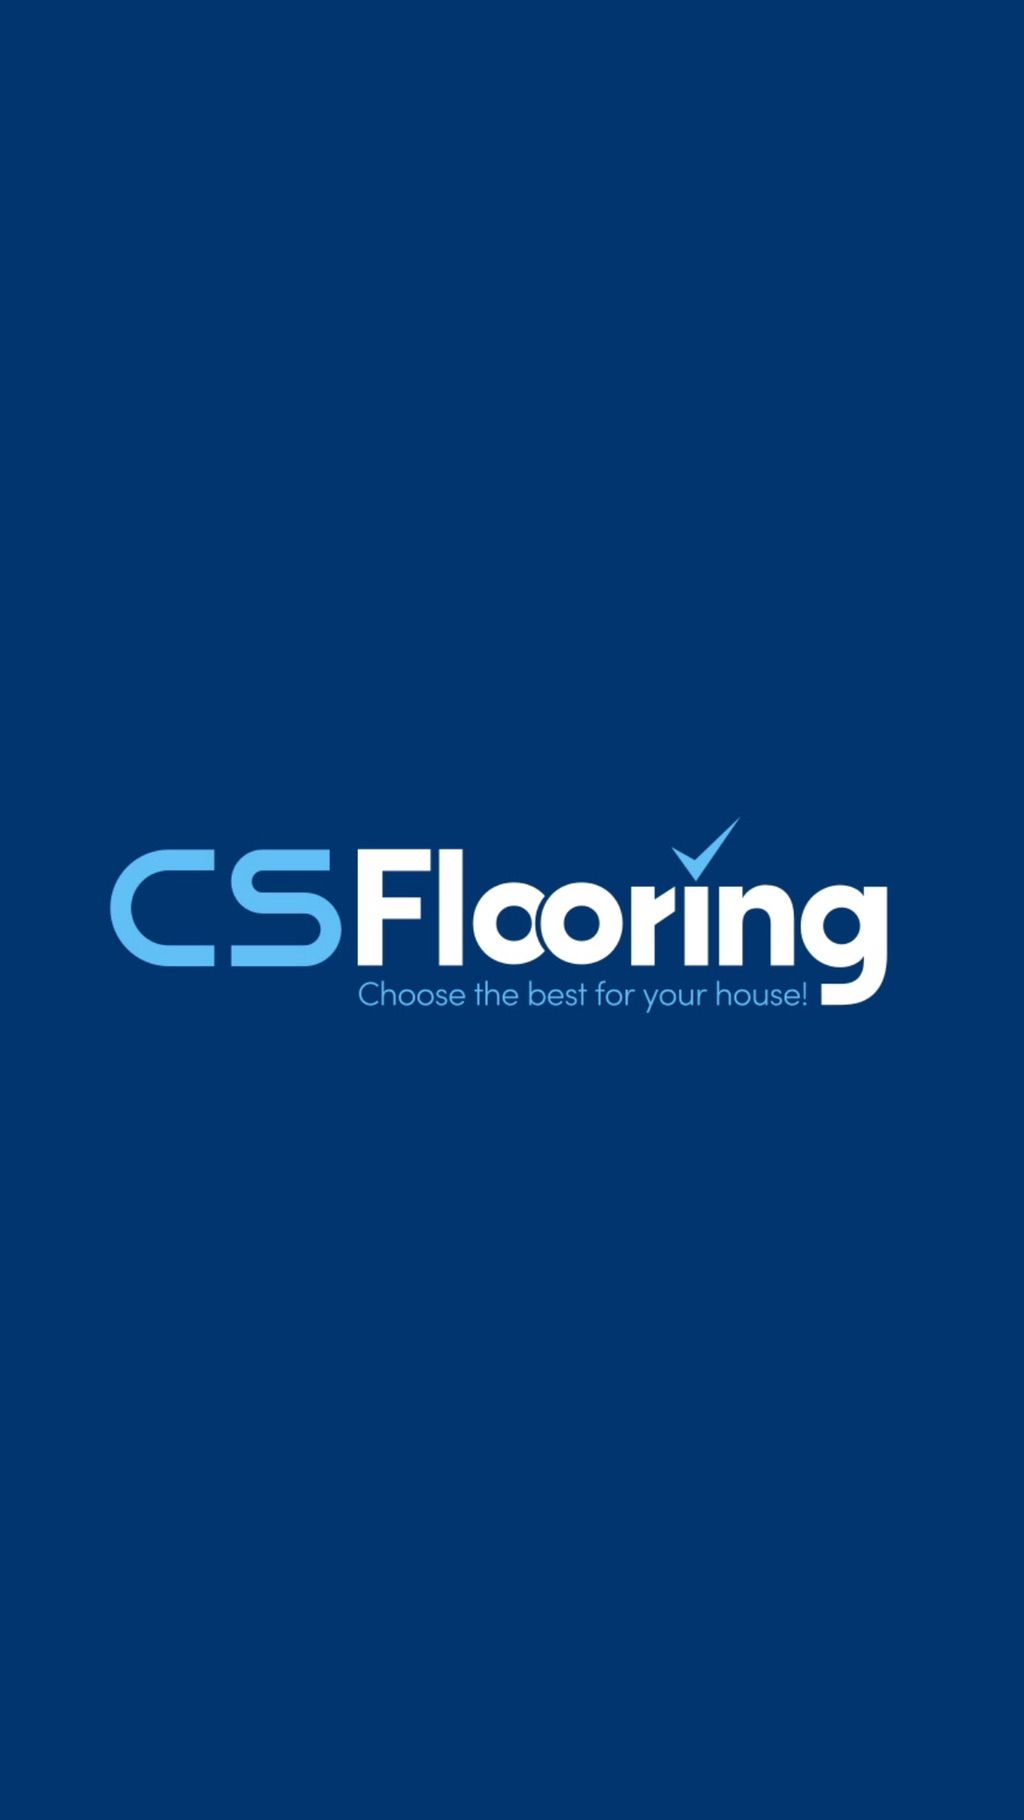 CS Flooring